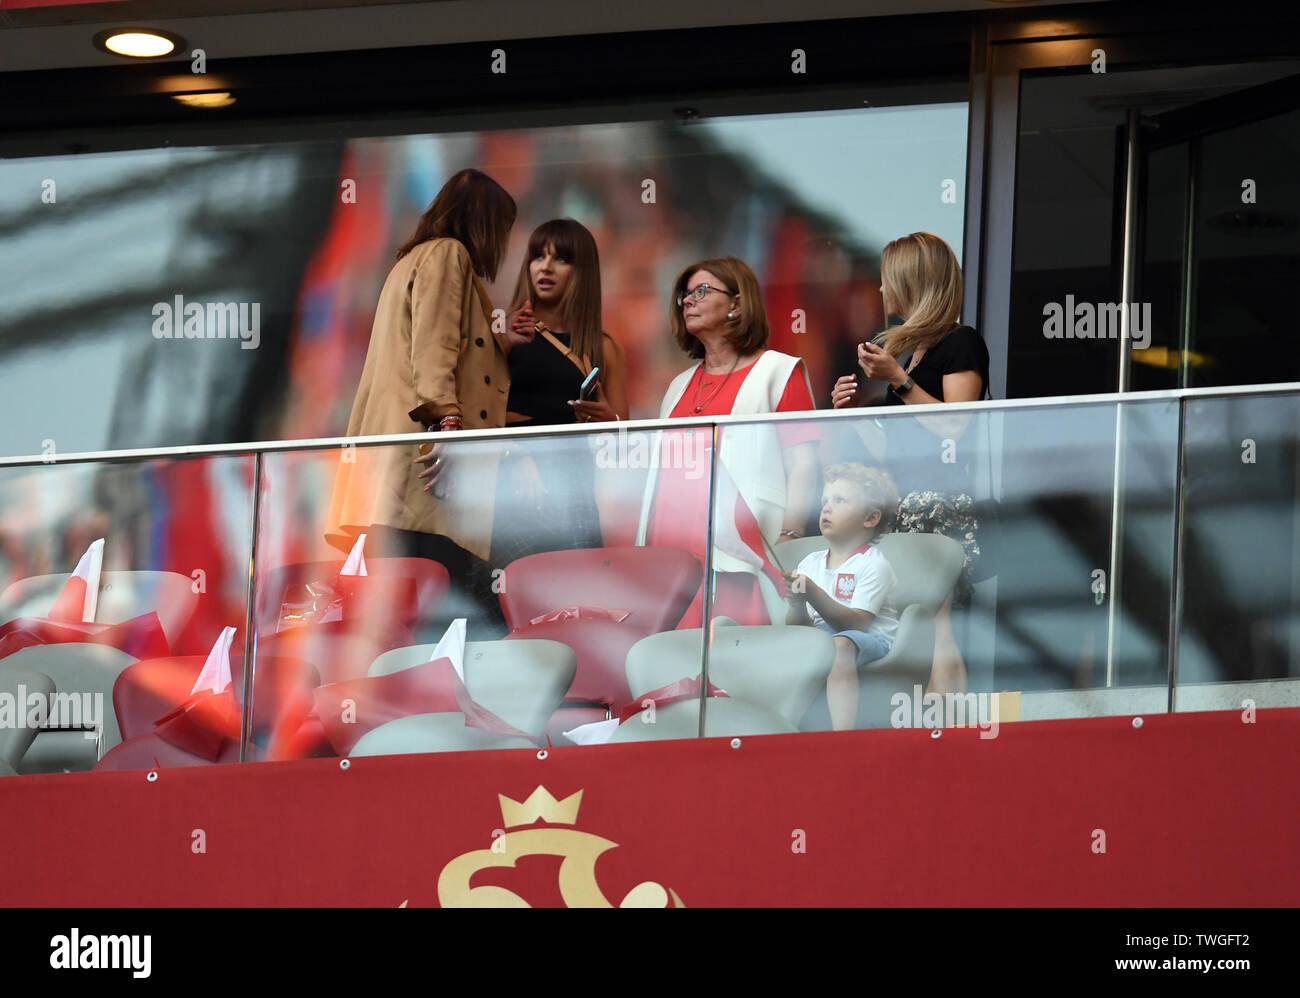 Warsaw, Poland, June 10, 2019: EURO 2020 qualifing round, group stage, Poland wins 4:0 with Izarel on PGE Narodowy. Anna Lewandowska wife of Robert Lewandowski (Poland) - Stock Image